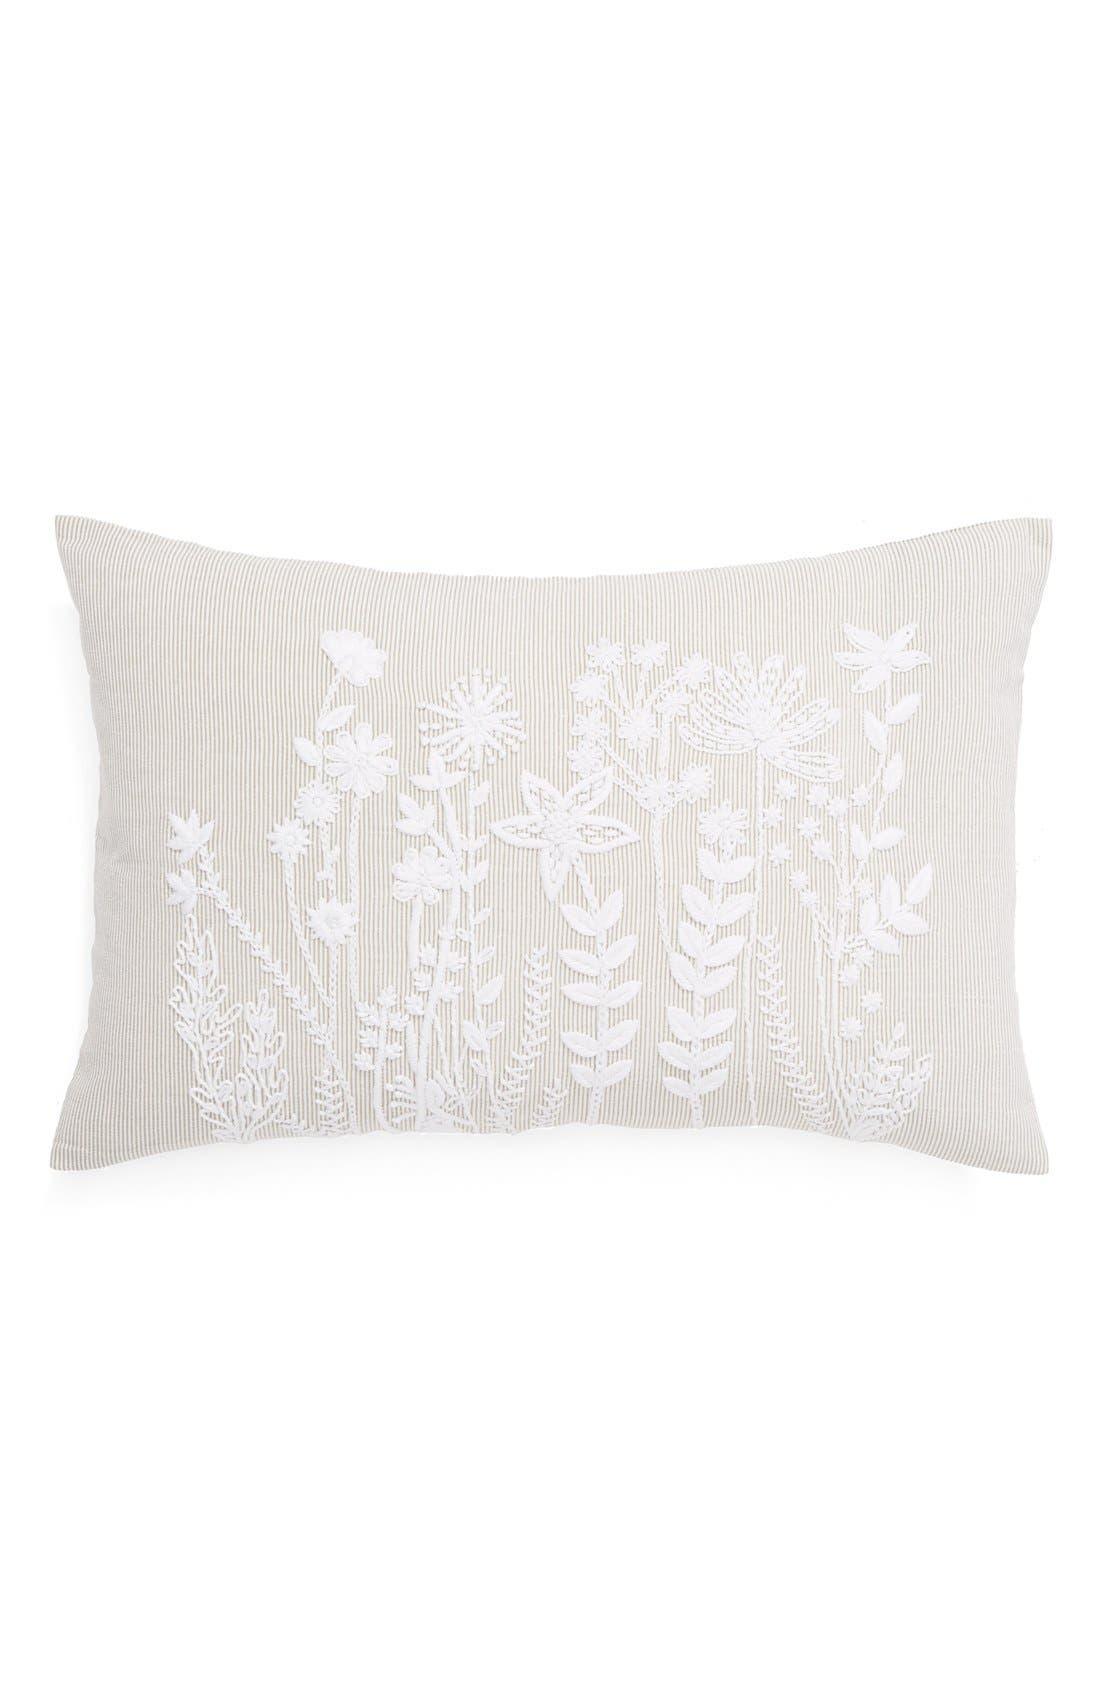 Alternate Image 1 Selected - Nordstrom at Home 'Flower Stripe' Pillow